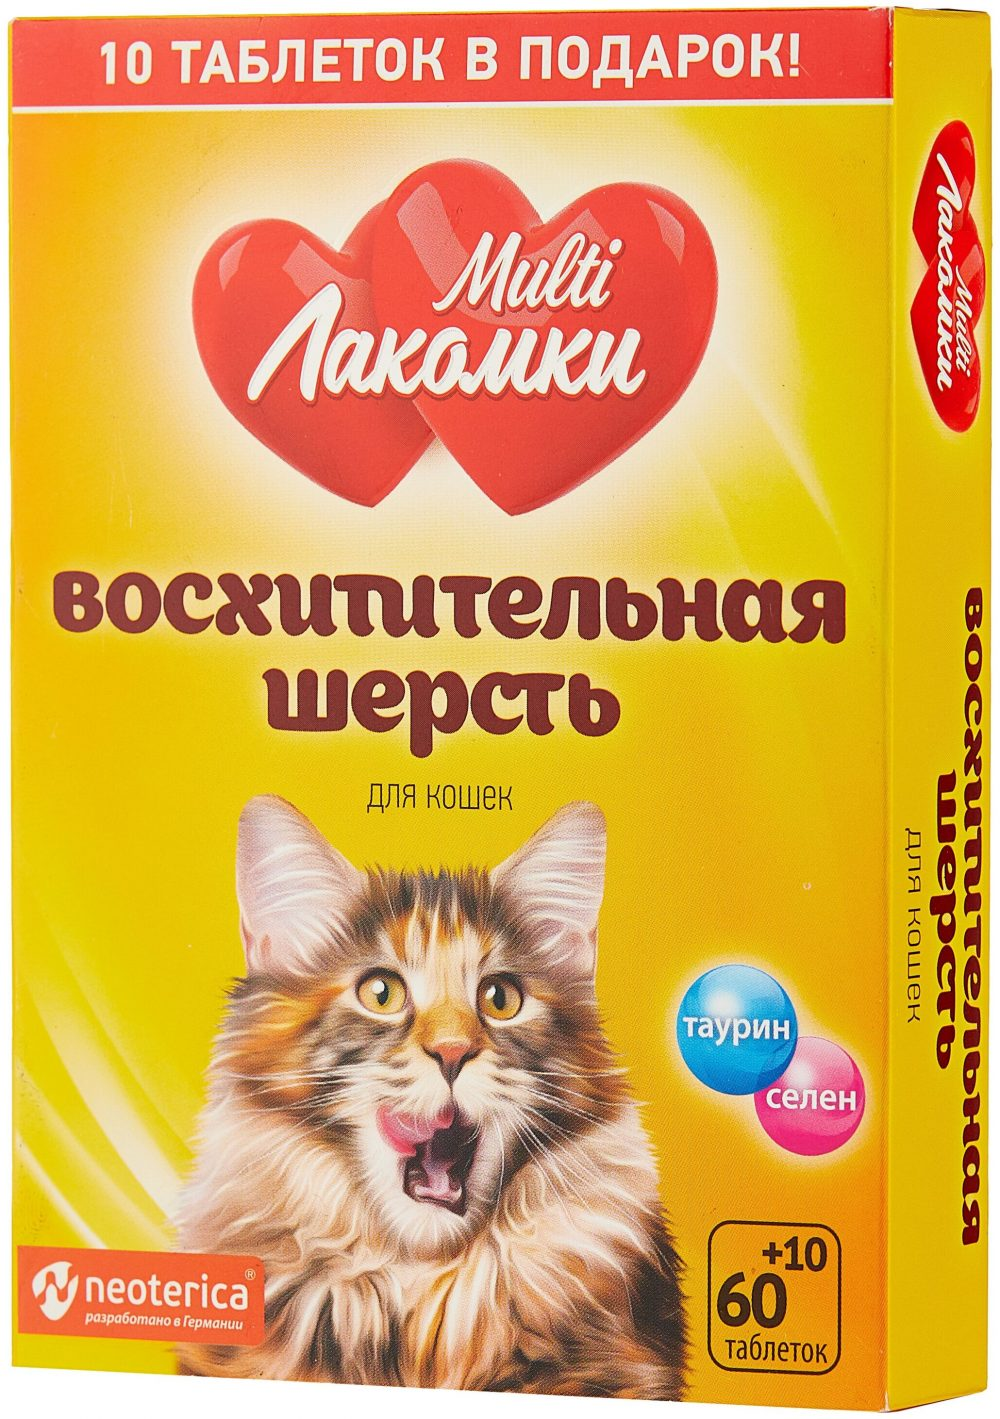 МультиЛакомки Восхитительная шерсть д/кошек 70 таб. L101